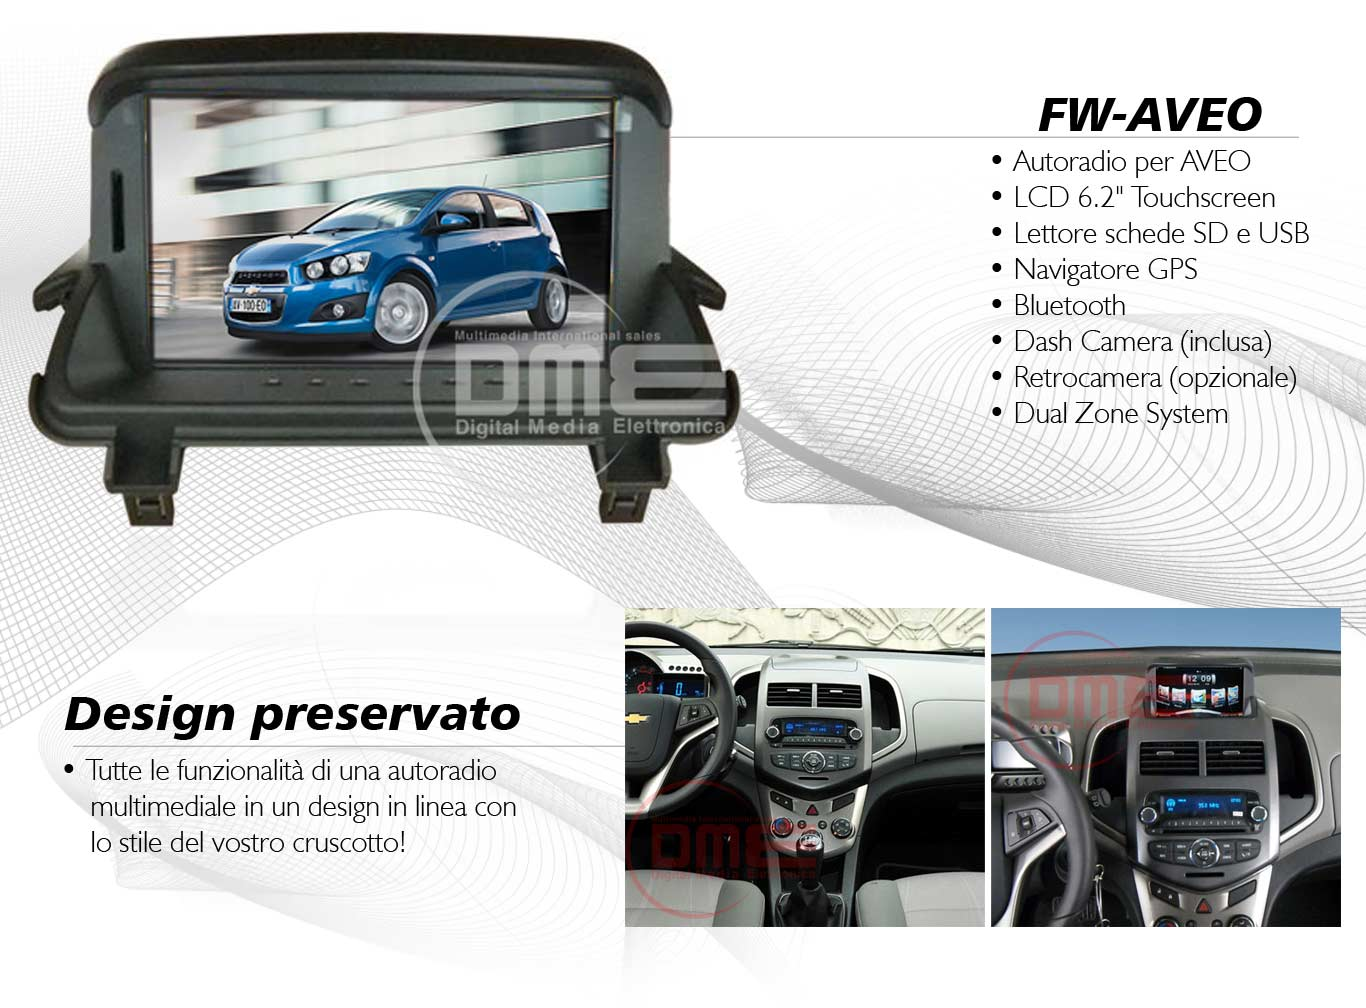 autoradio multimediale per Chevrolet Aveo